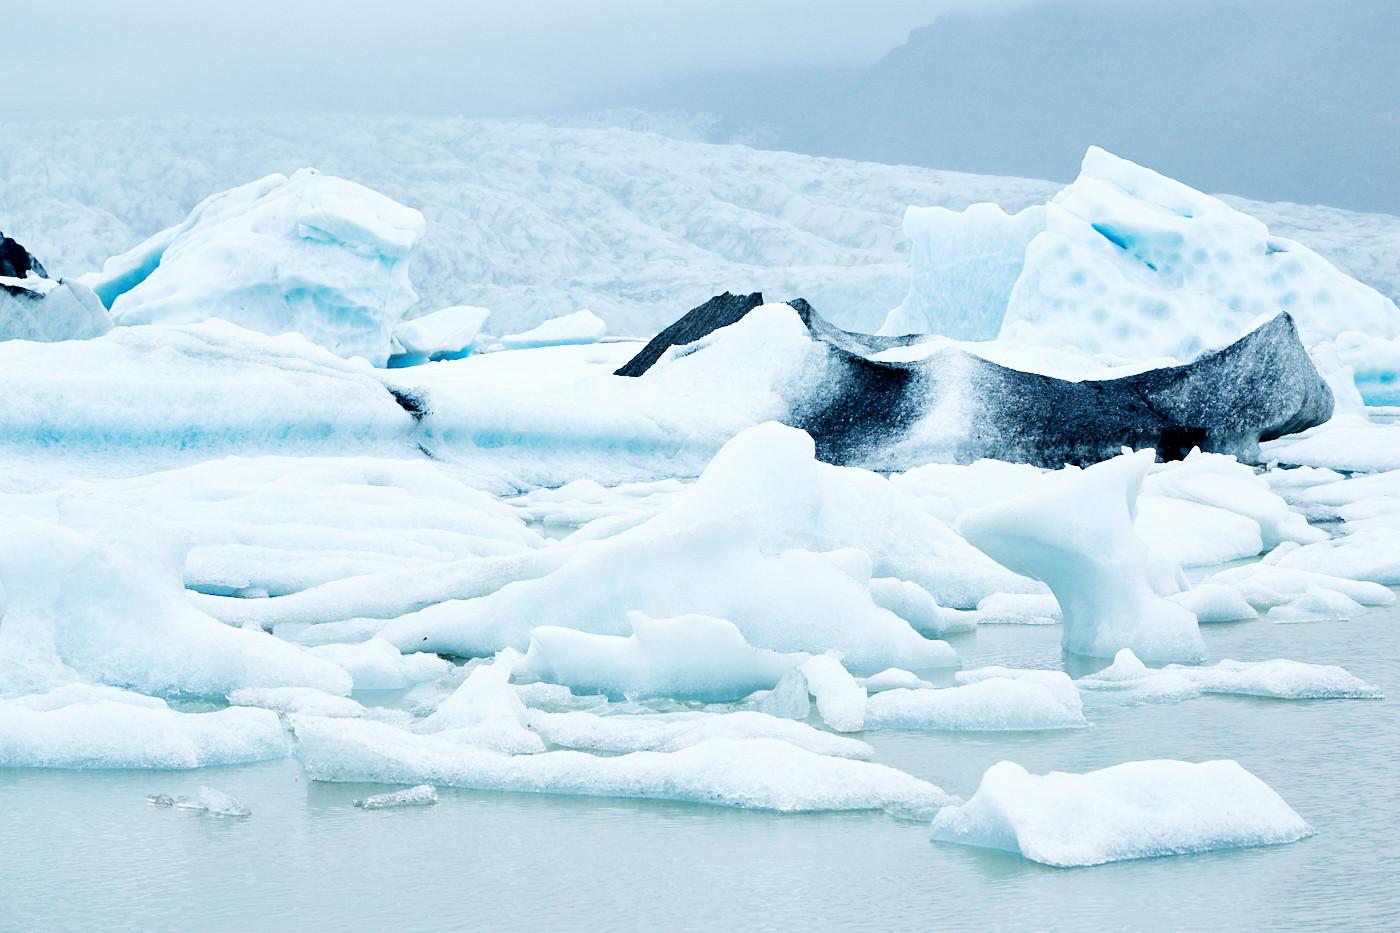 Fjallsárlón, eis, eisscholle, eisschollen, vulkanasche in eisblock, fjallsarlon, ice lagoon, ice lake, Eissee, Gletschersee, Island, iceland, roadtrip, rundreise, reiseblogger, travelblogger, miles and shores,